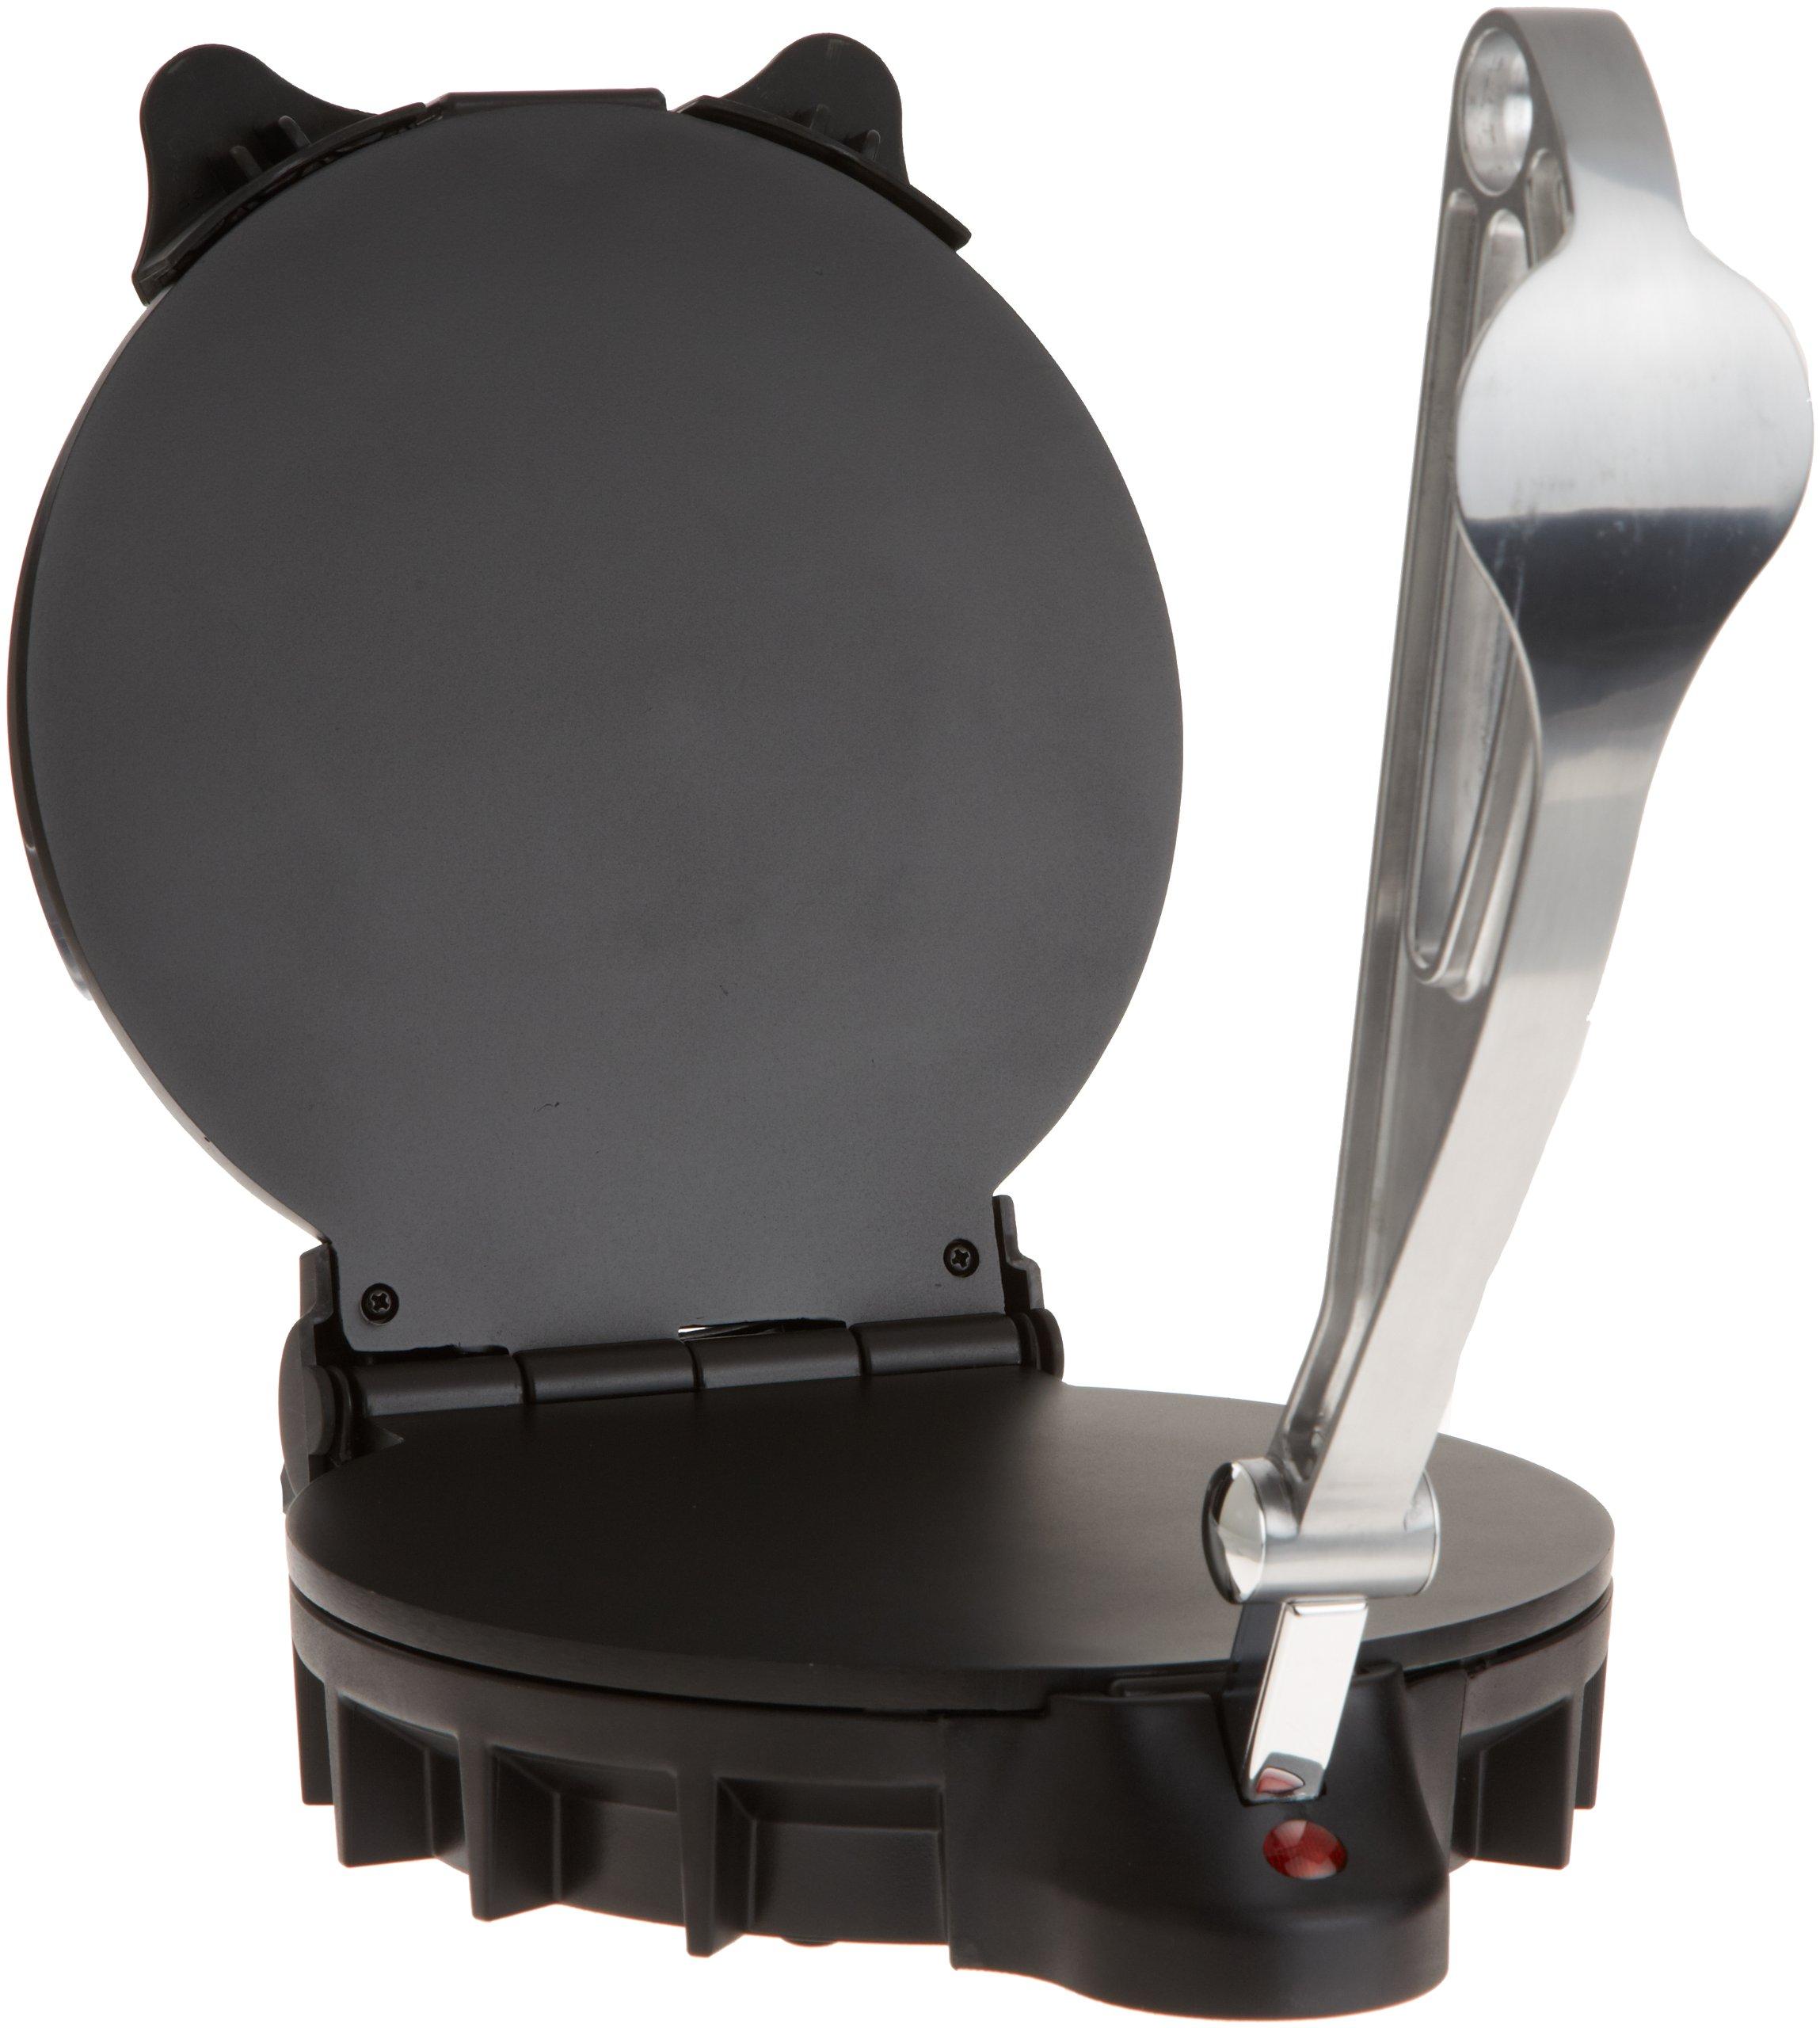 Electric Tortilla Maker- Homemade Flatbread, Pitas, Tortillas- Heavy Duty, Non-Stick Cooker Easier Than Tortilla Press by CucinaPro